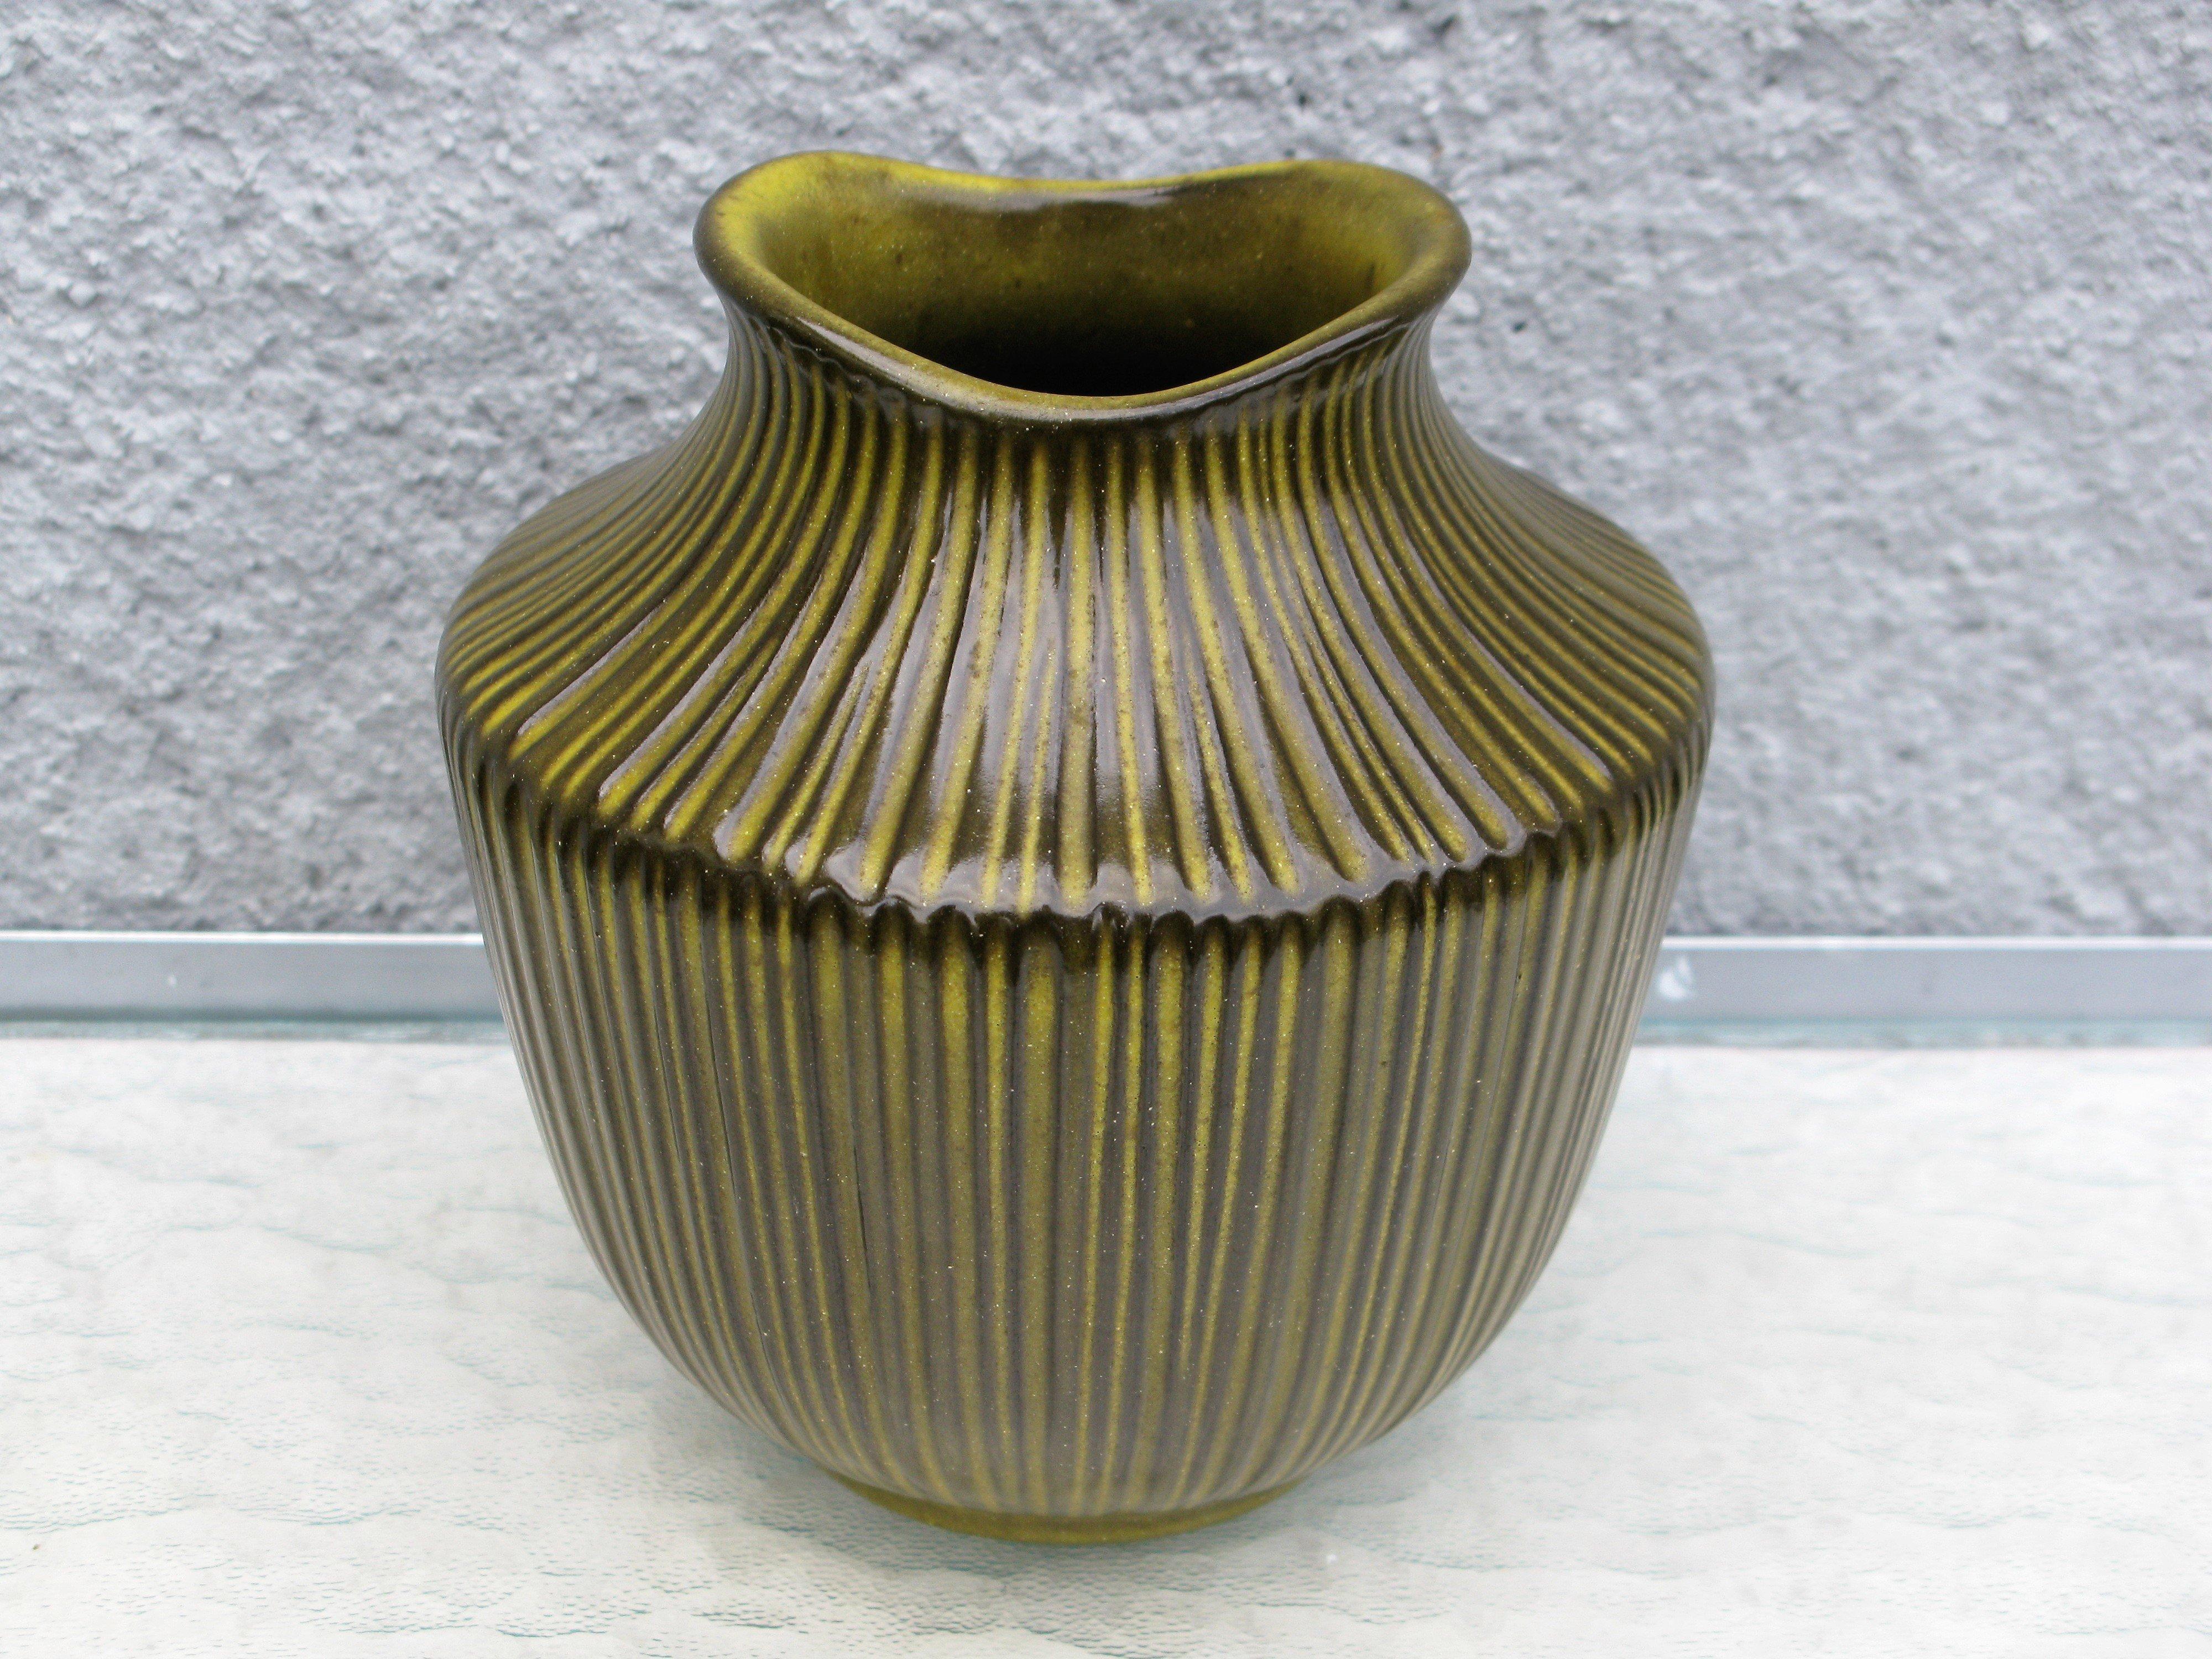 amarillo vase 9012s